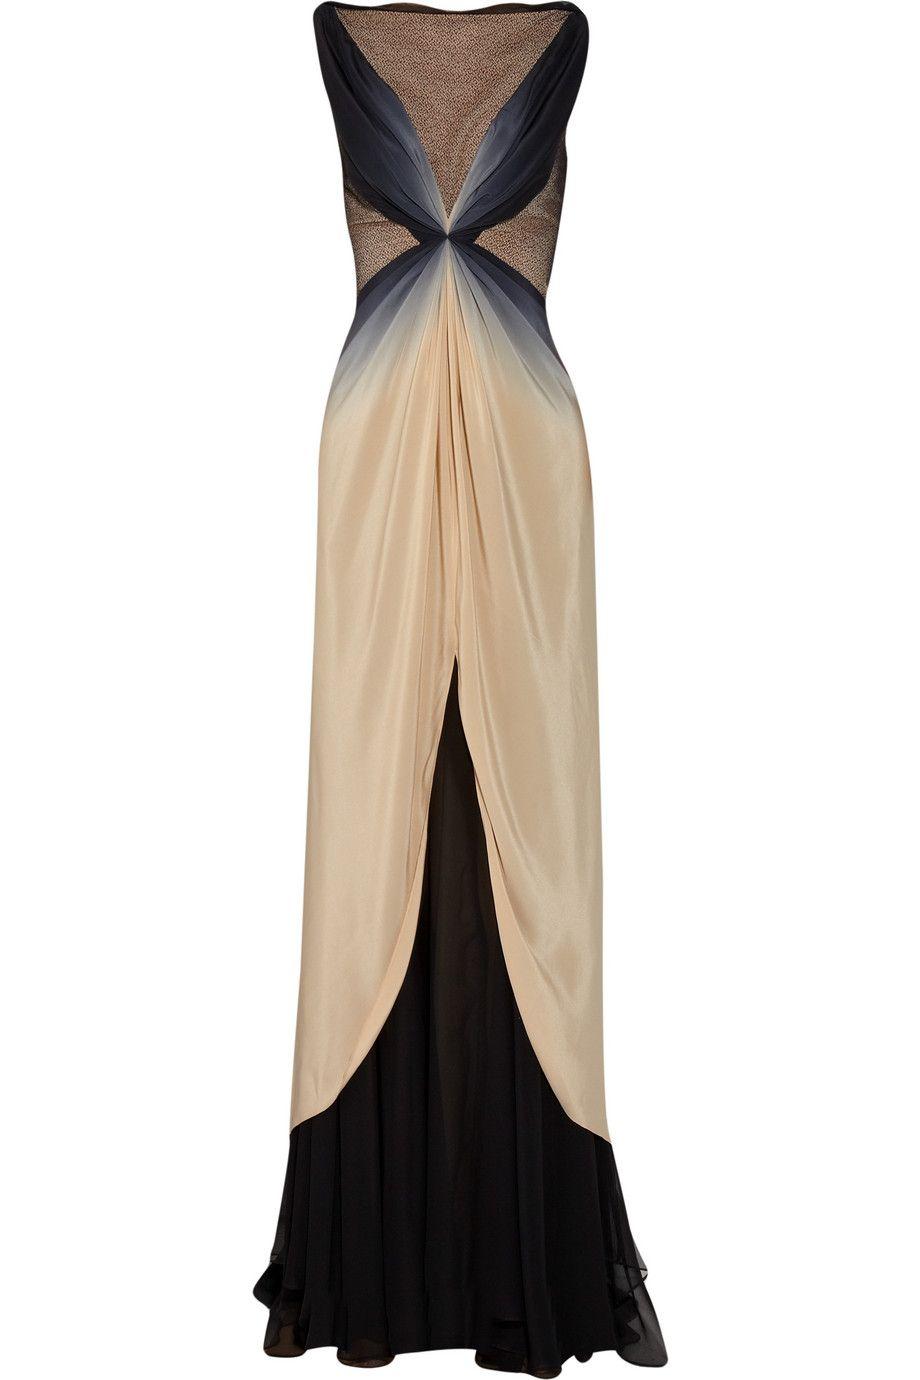 Zac Posen ombre silk gown. Sigh.